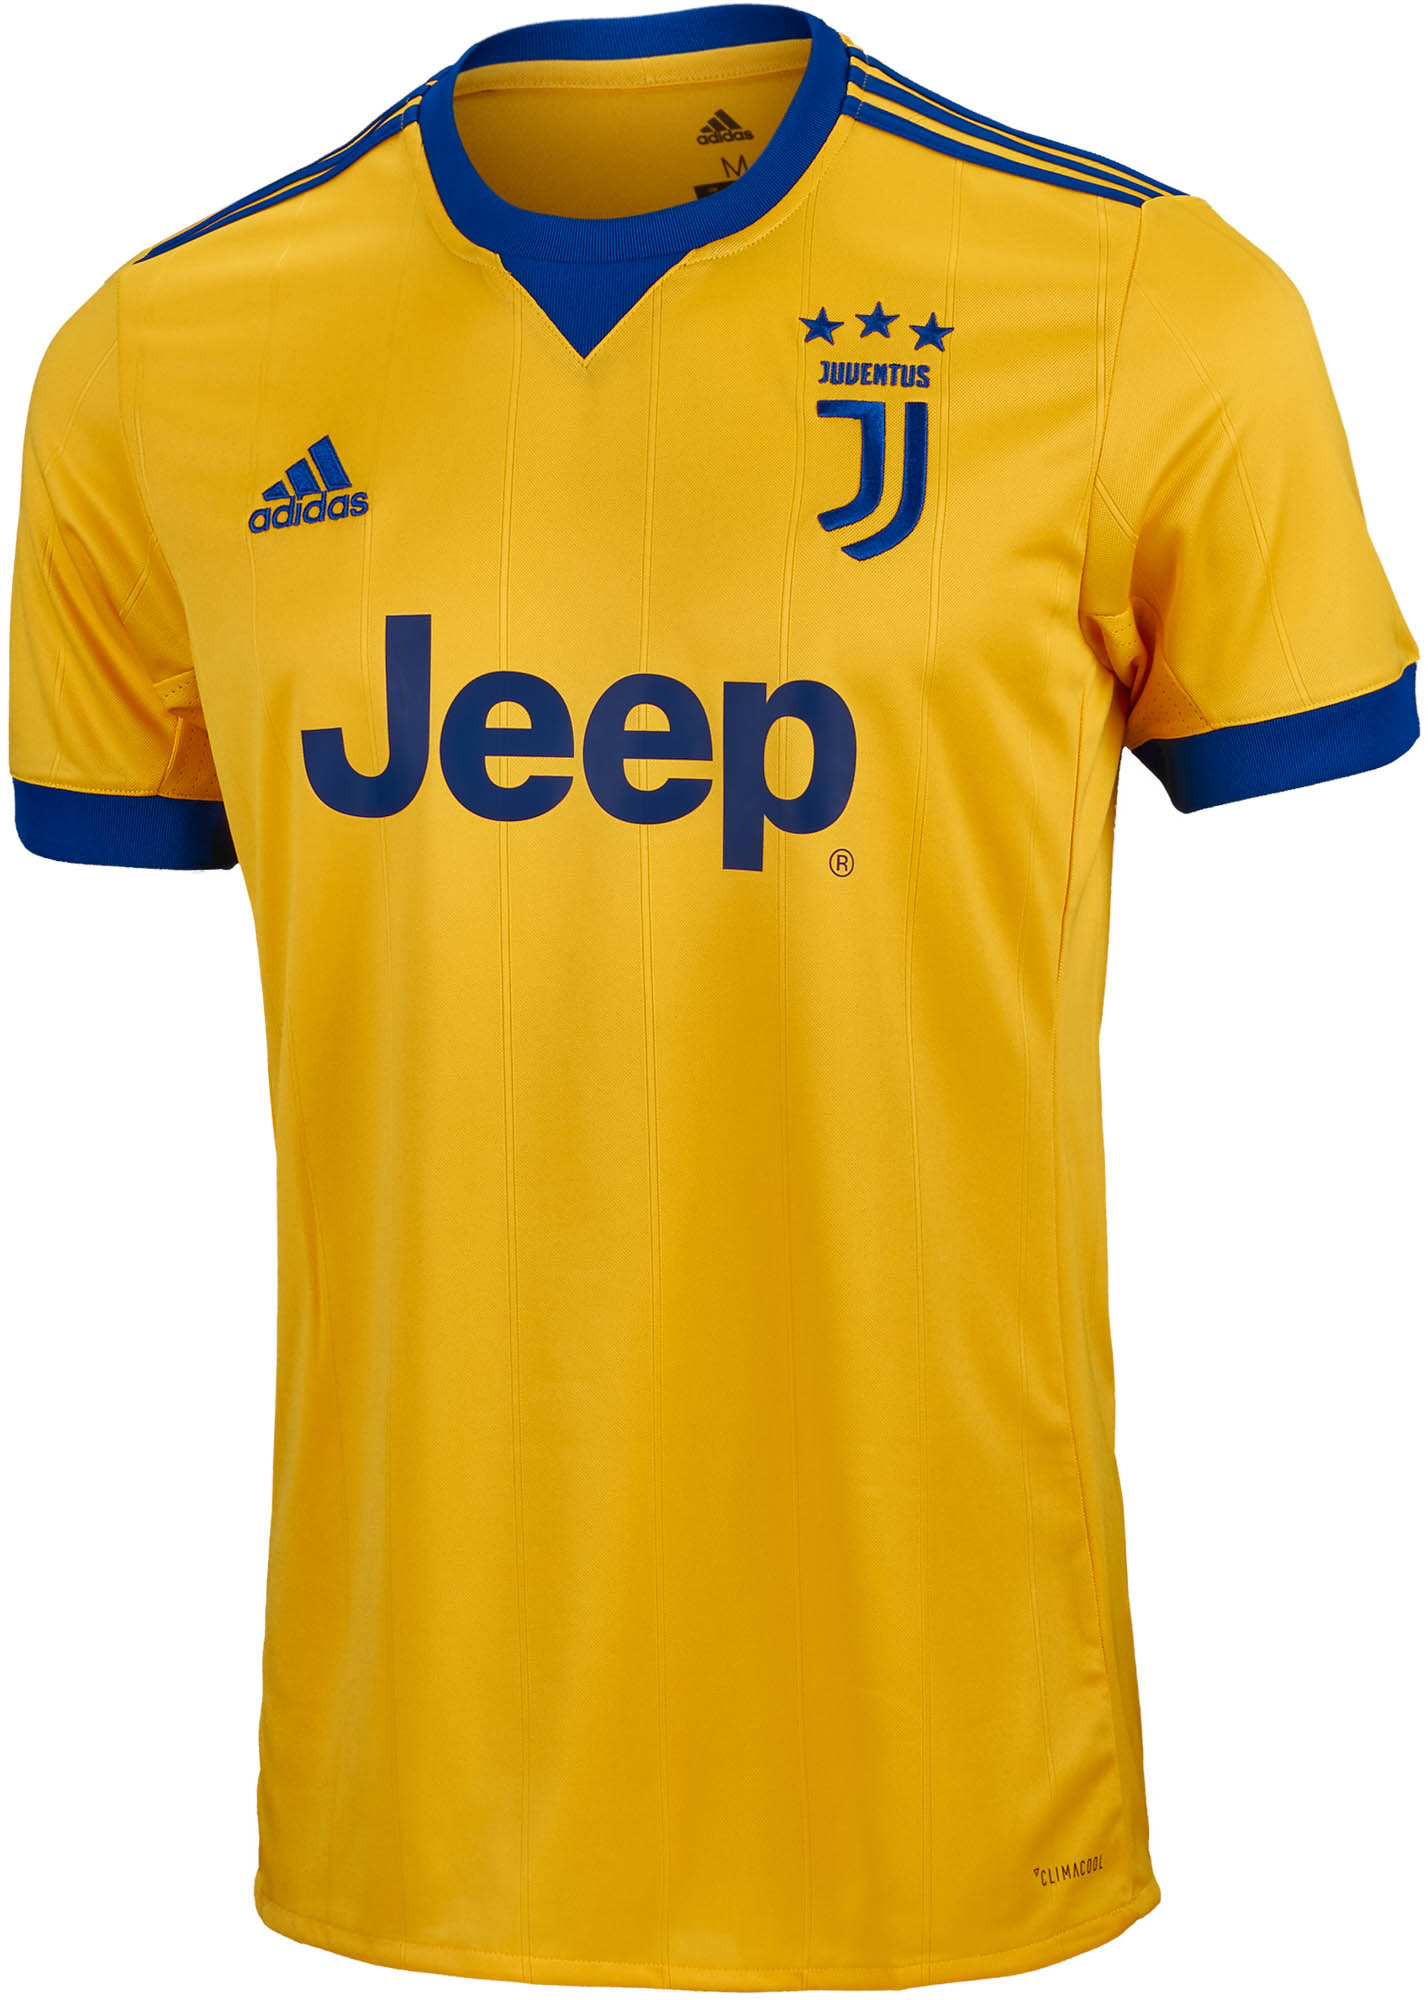 035d5beafd6 adidas Juventus Away Jersey 2017-18 NS - Soccer Master